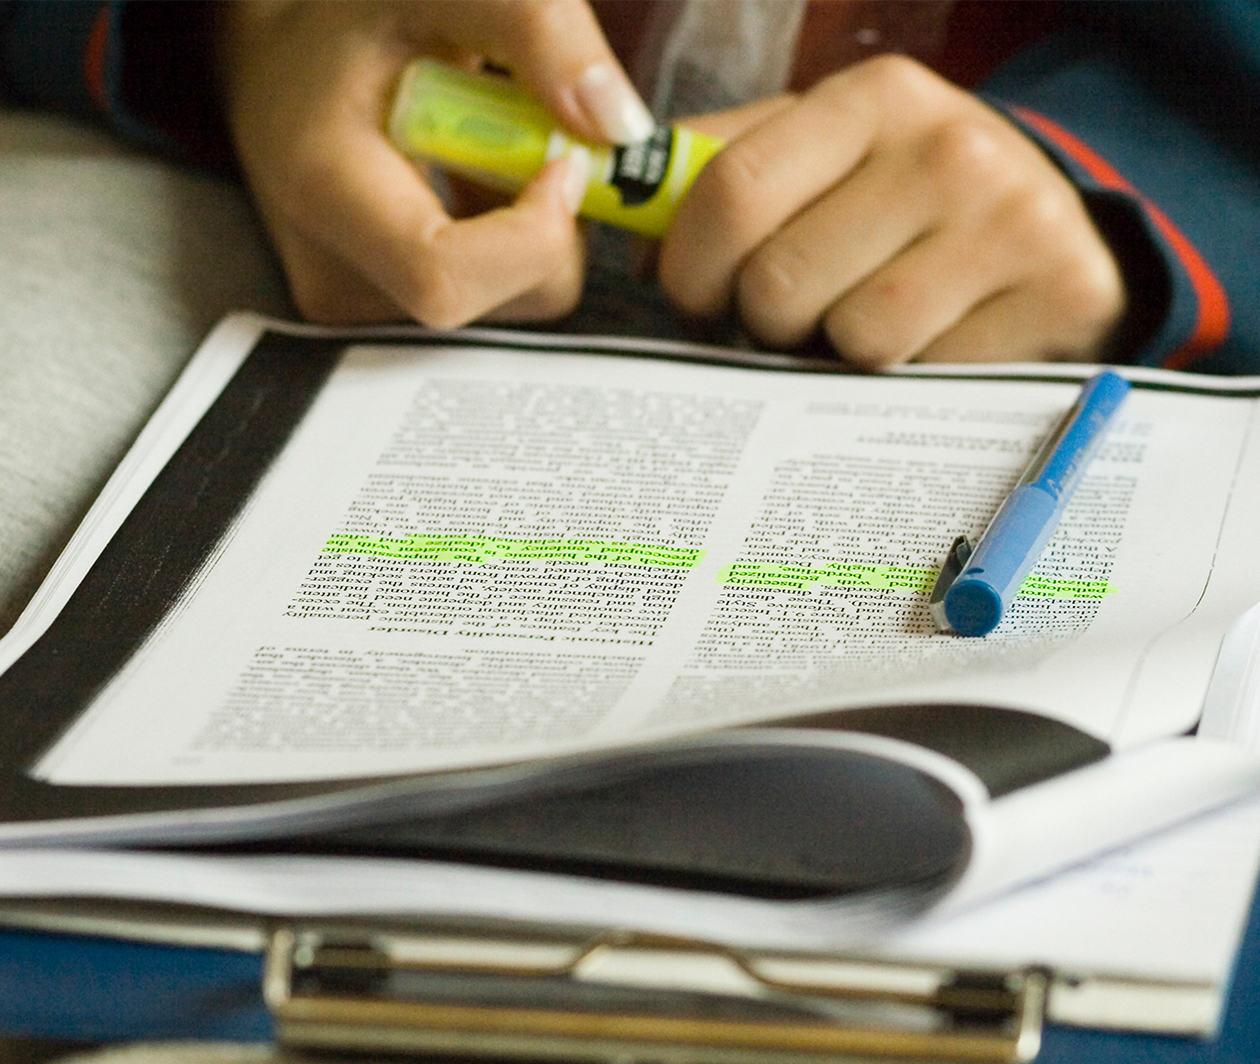 Critical Appraisal Techniques for Healthcare Literature